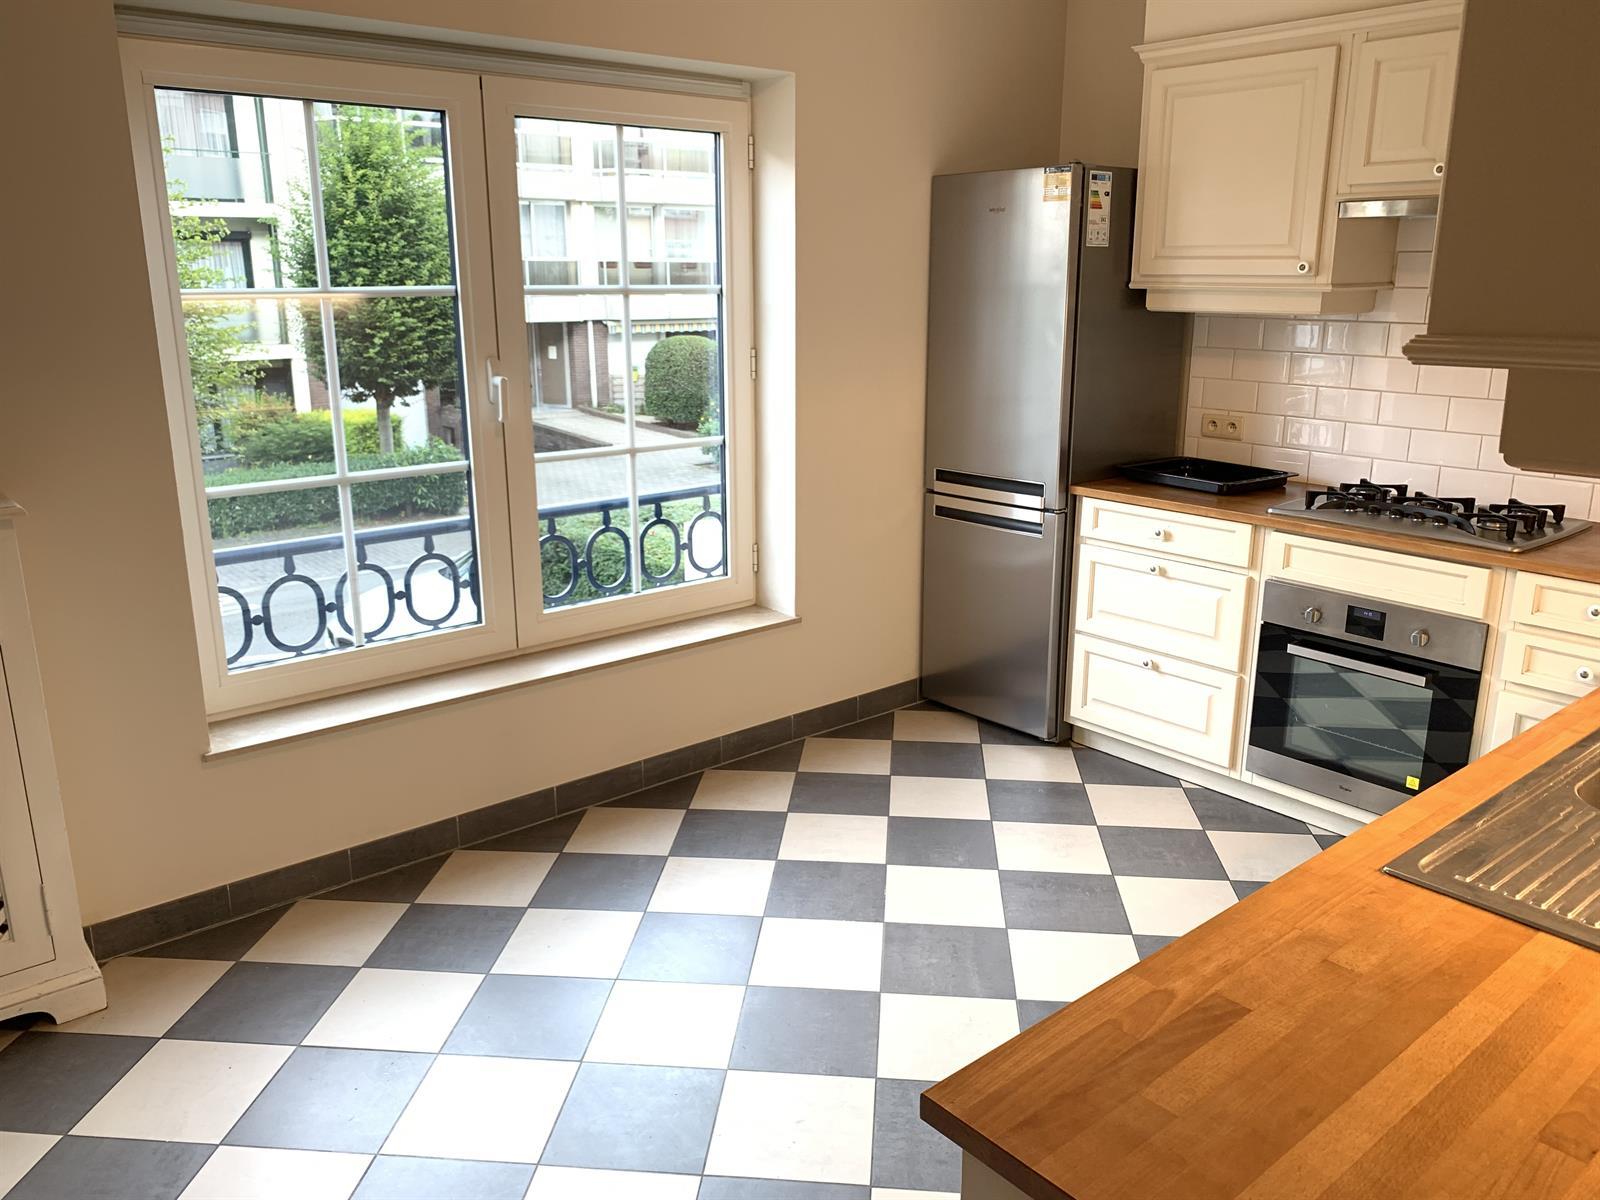 Appartement exceptionnel - Woluwe-Saint-Pierre - #4433539-25